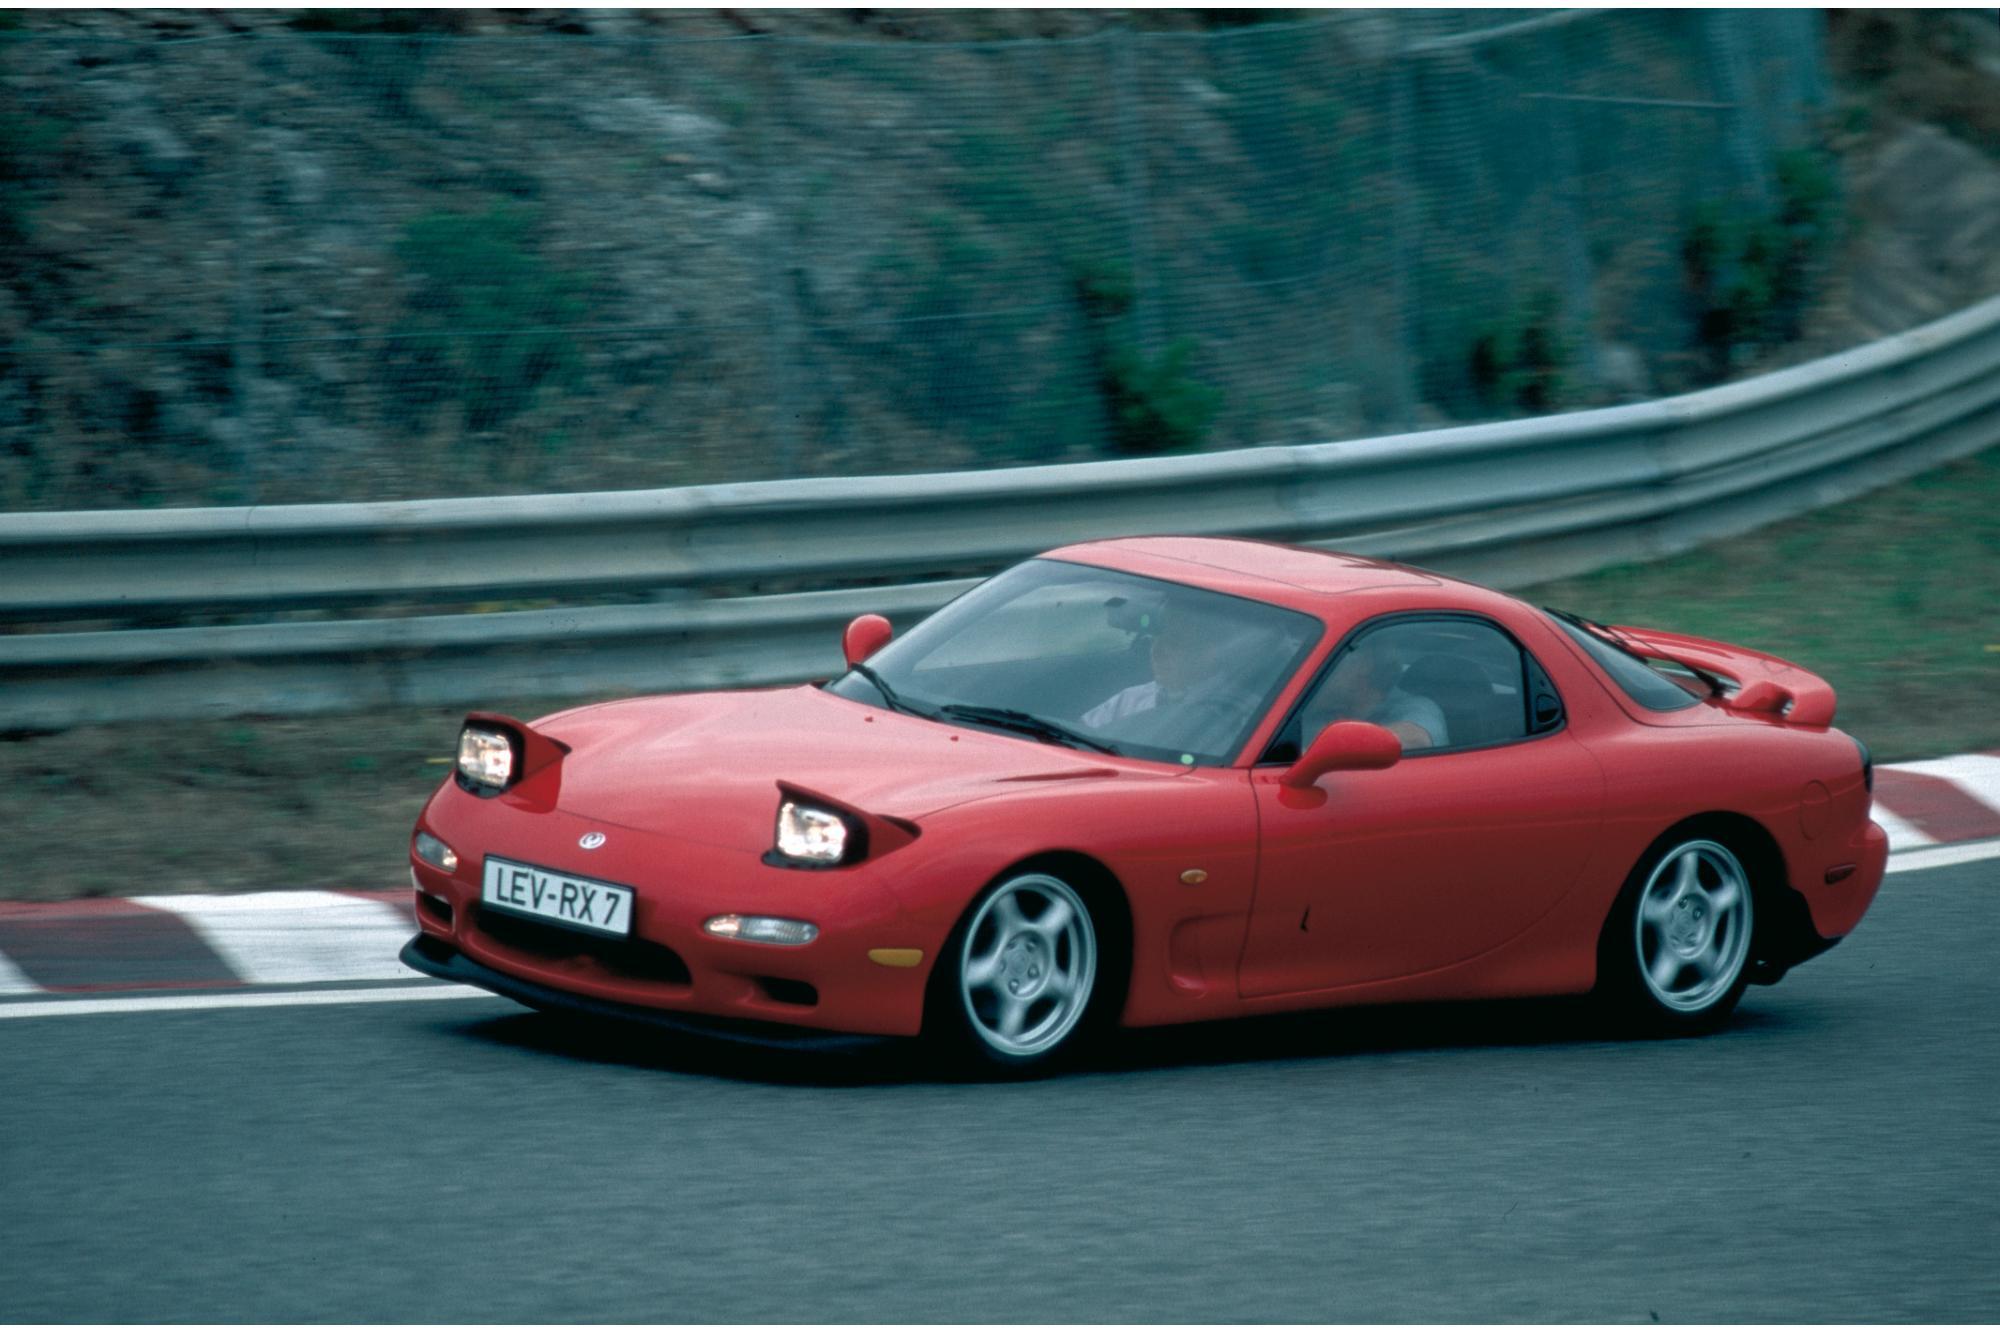 Mazda RX-7: Επαναπροσδιορίζοντας την οδηγική απόλαυση.